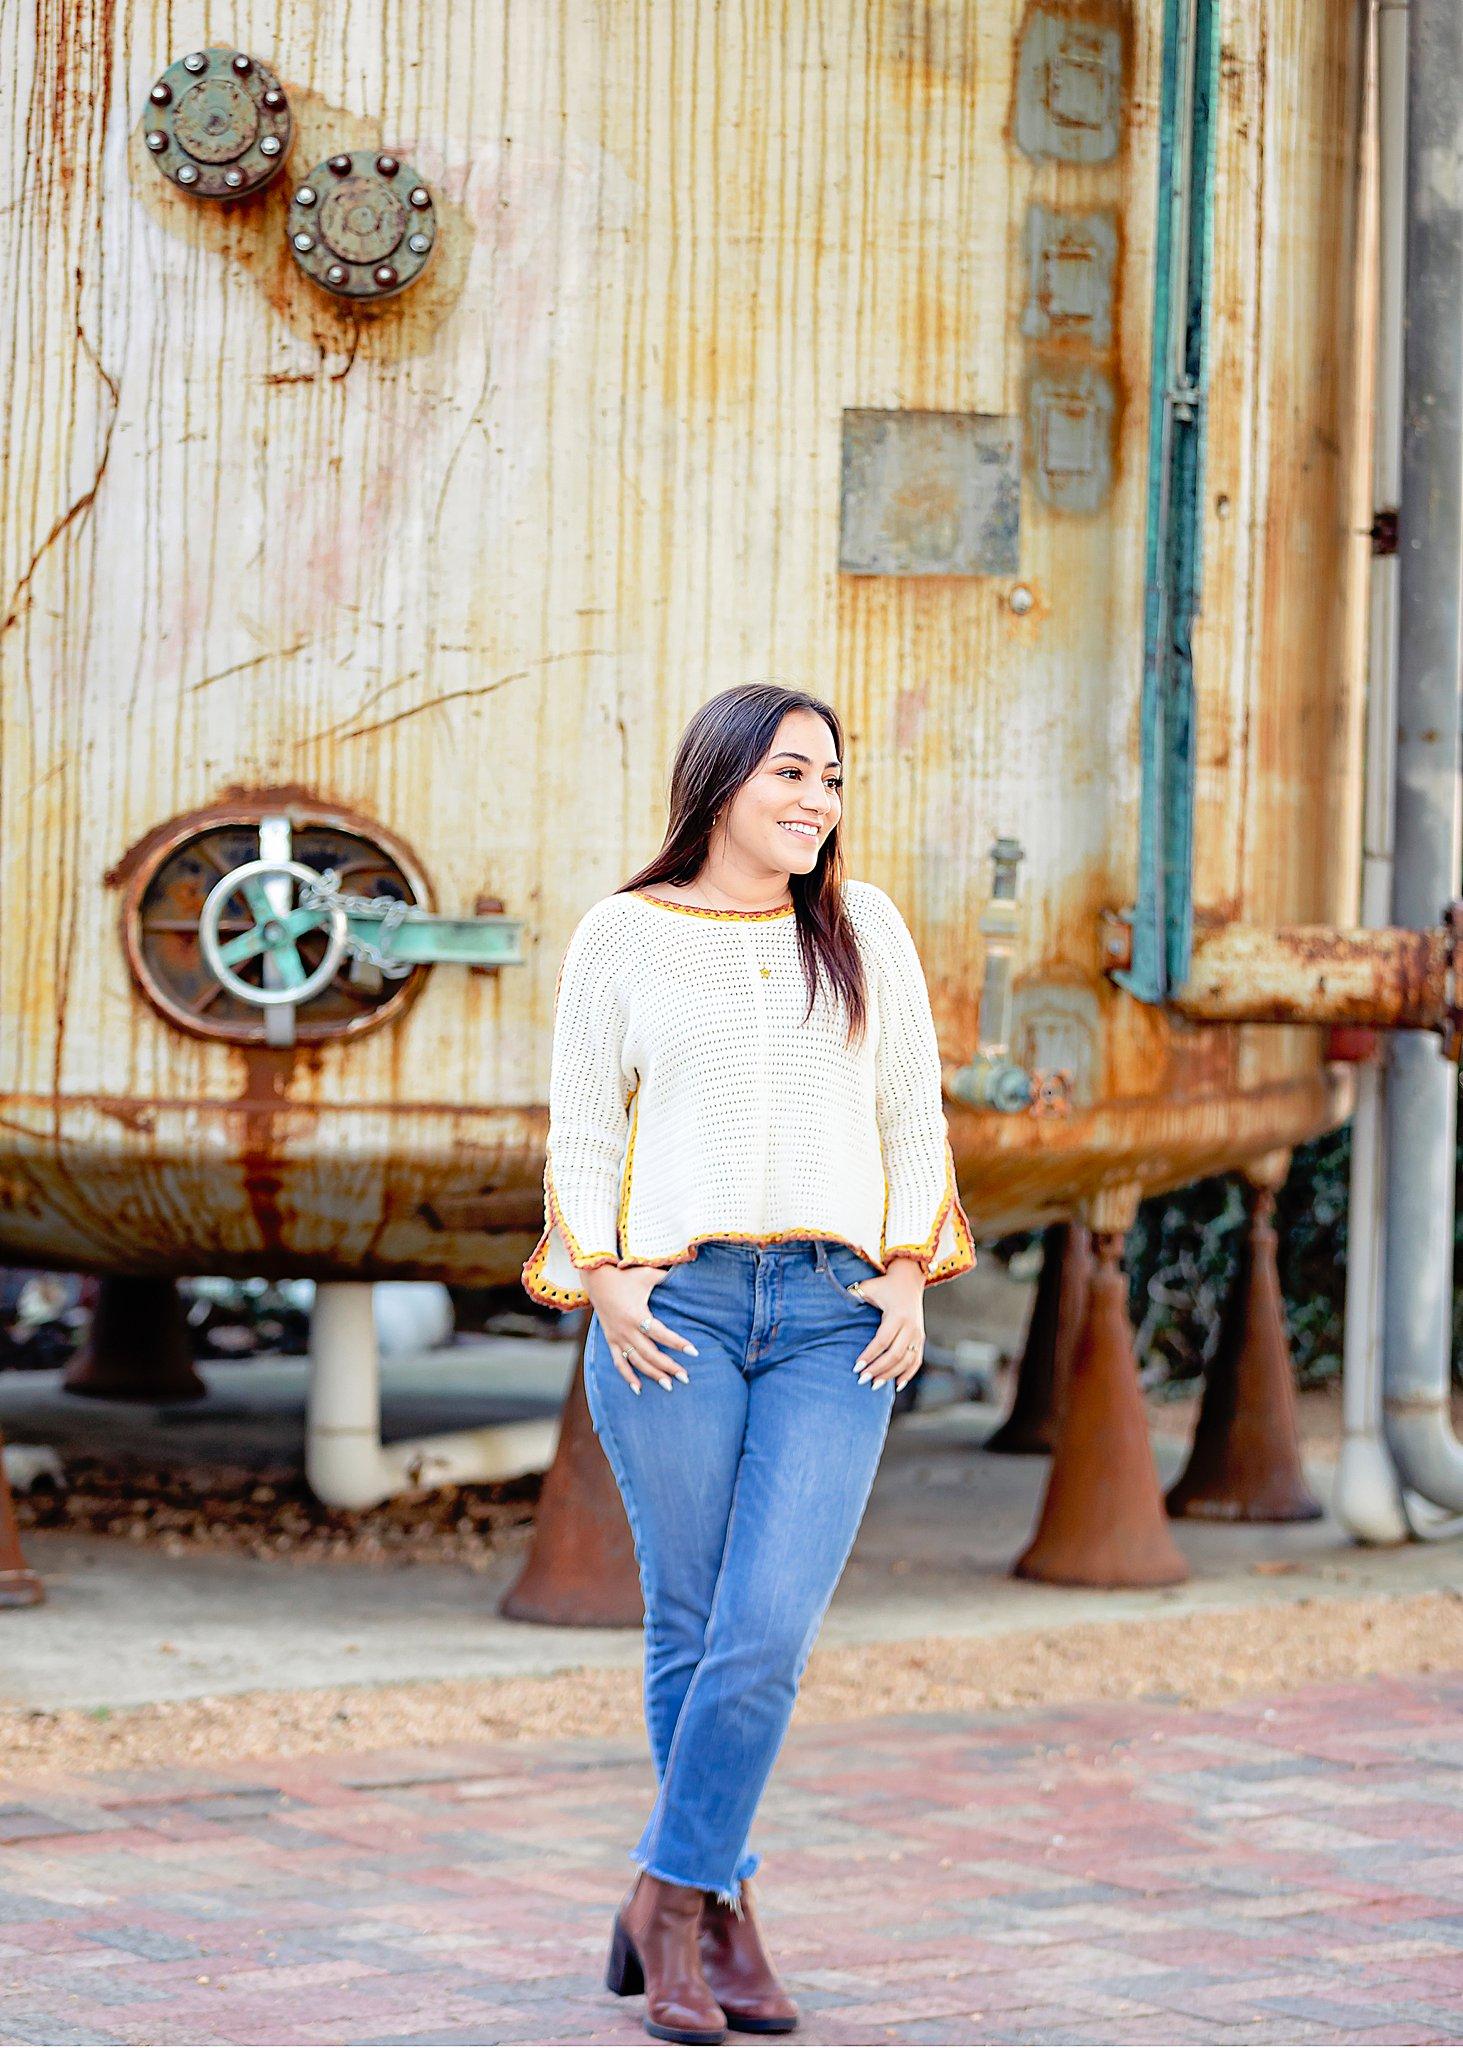 Carly-Barton-Photography-Texas-Photographer-High-School-Senior-Photos-The-Historic-Pearl-San-Antonio_0014.jpg